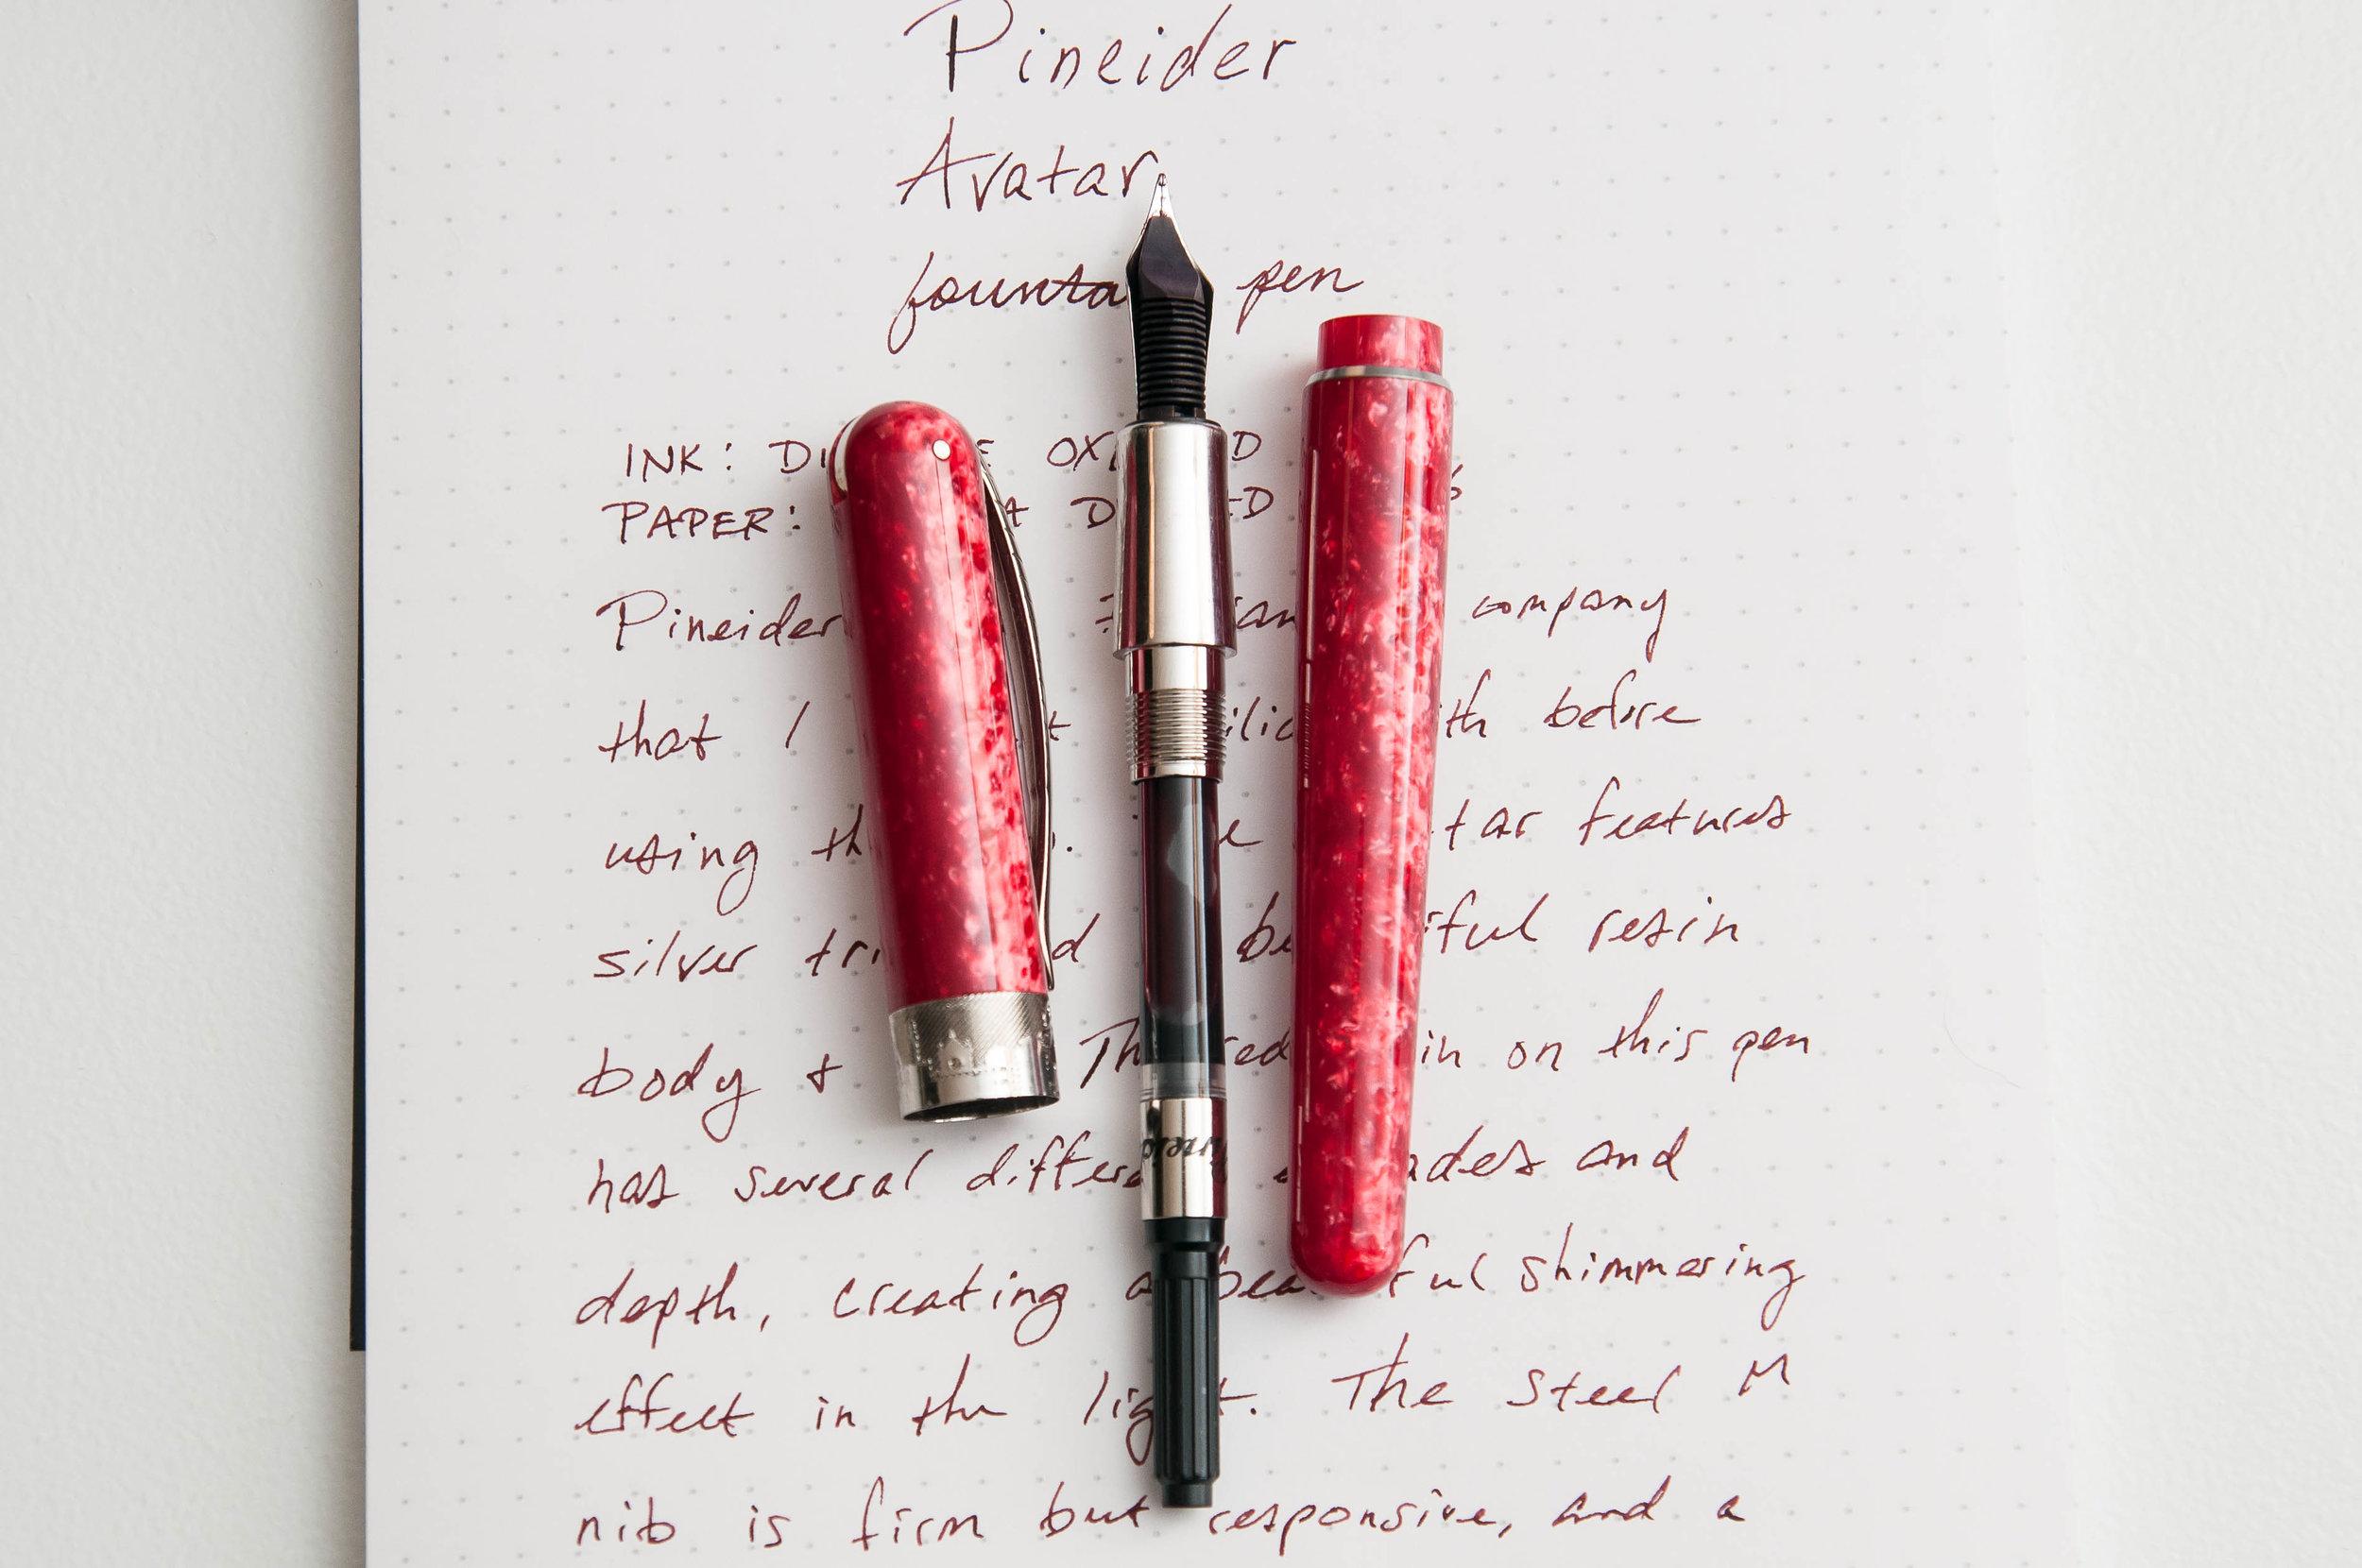 Pineider Avatar Fountain Pen Converter